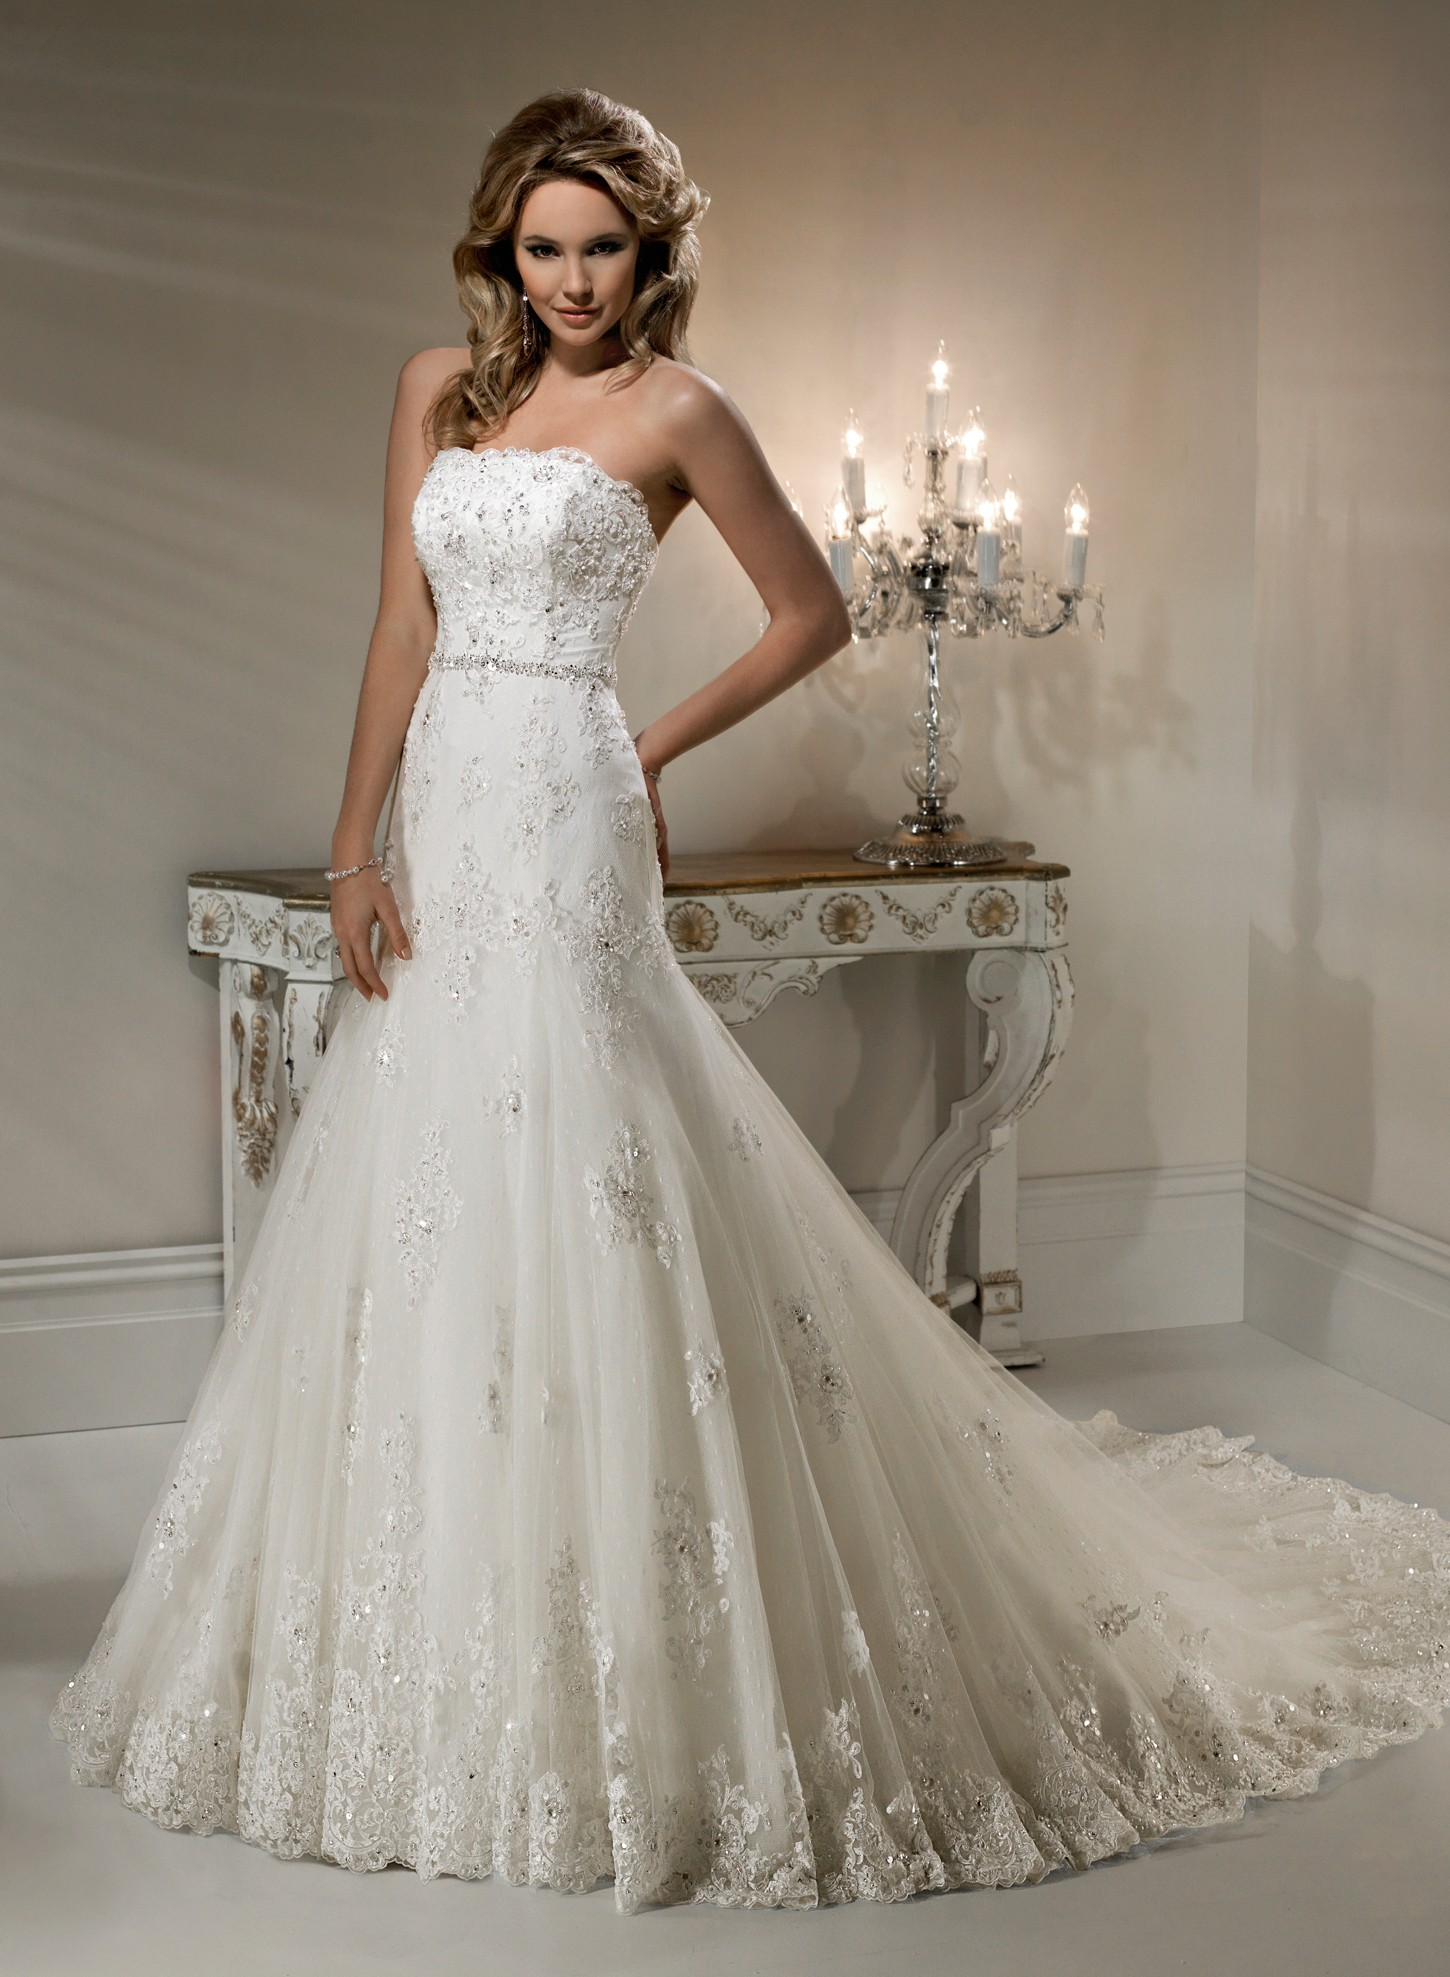 Lace Wedding Dress  DressedUpGirlcom